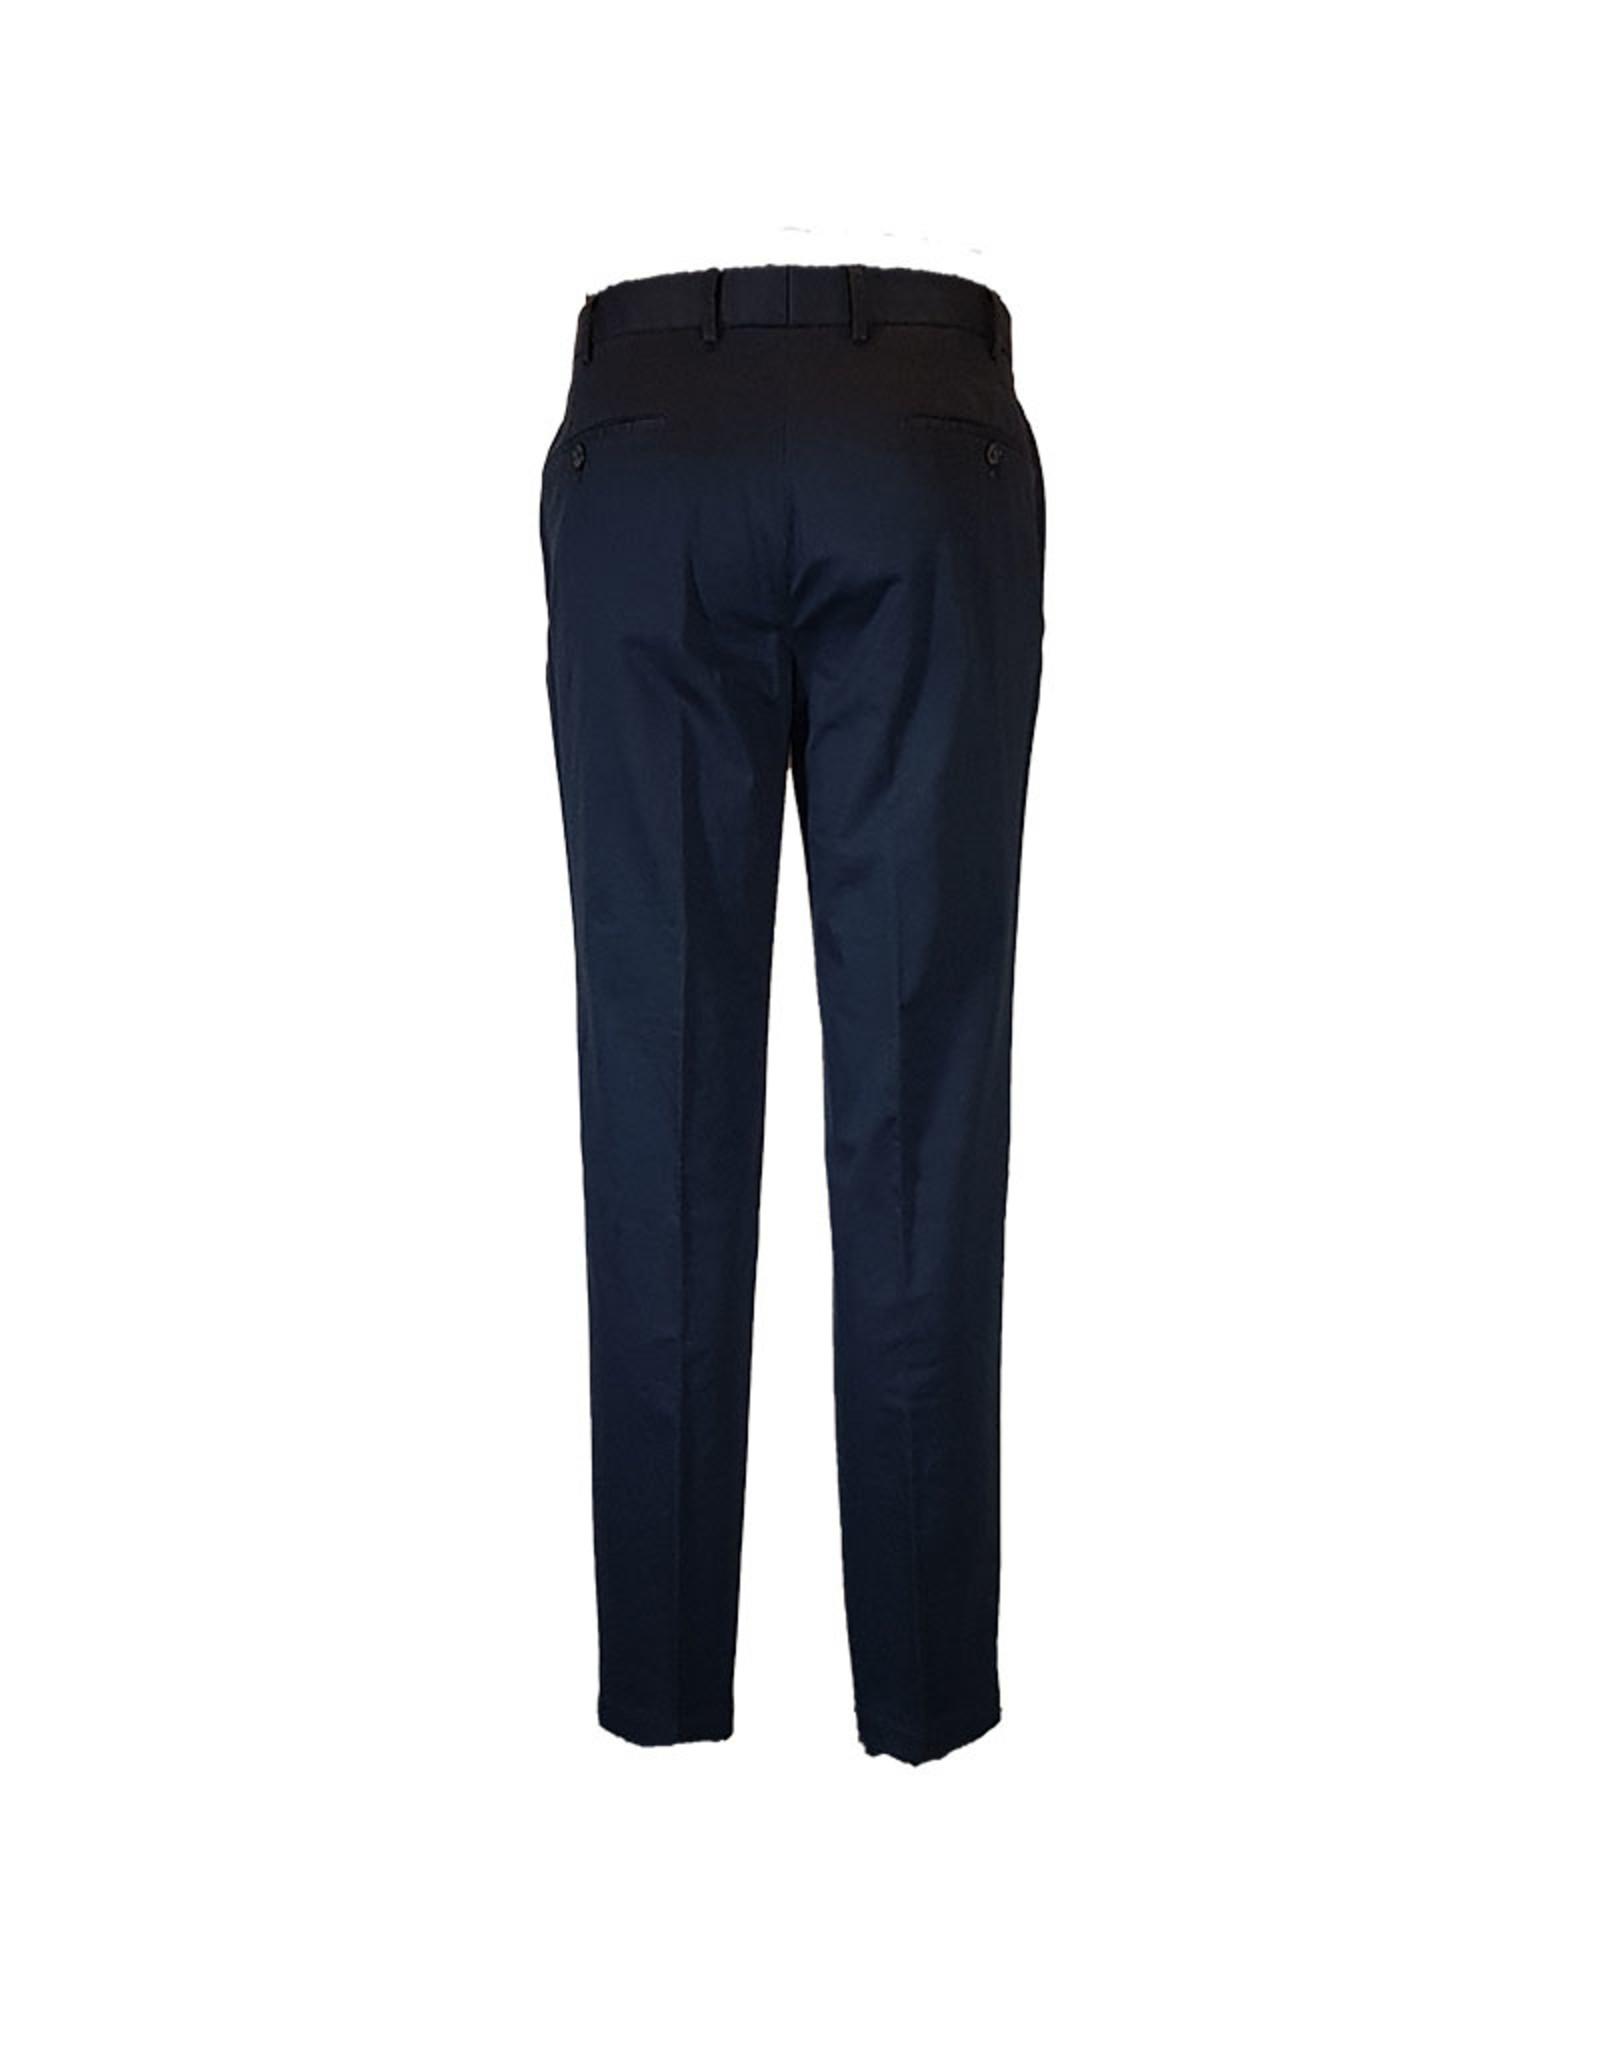 Hiltl Hiltl broek katoen blauw Parma 73600/40